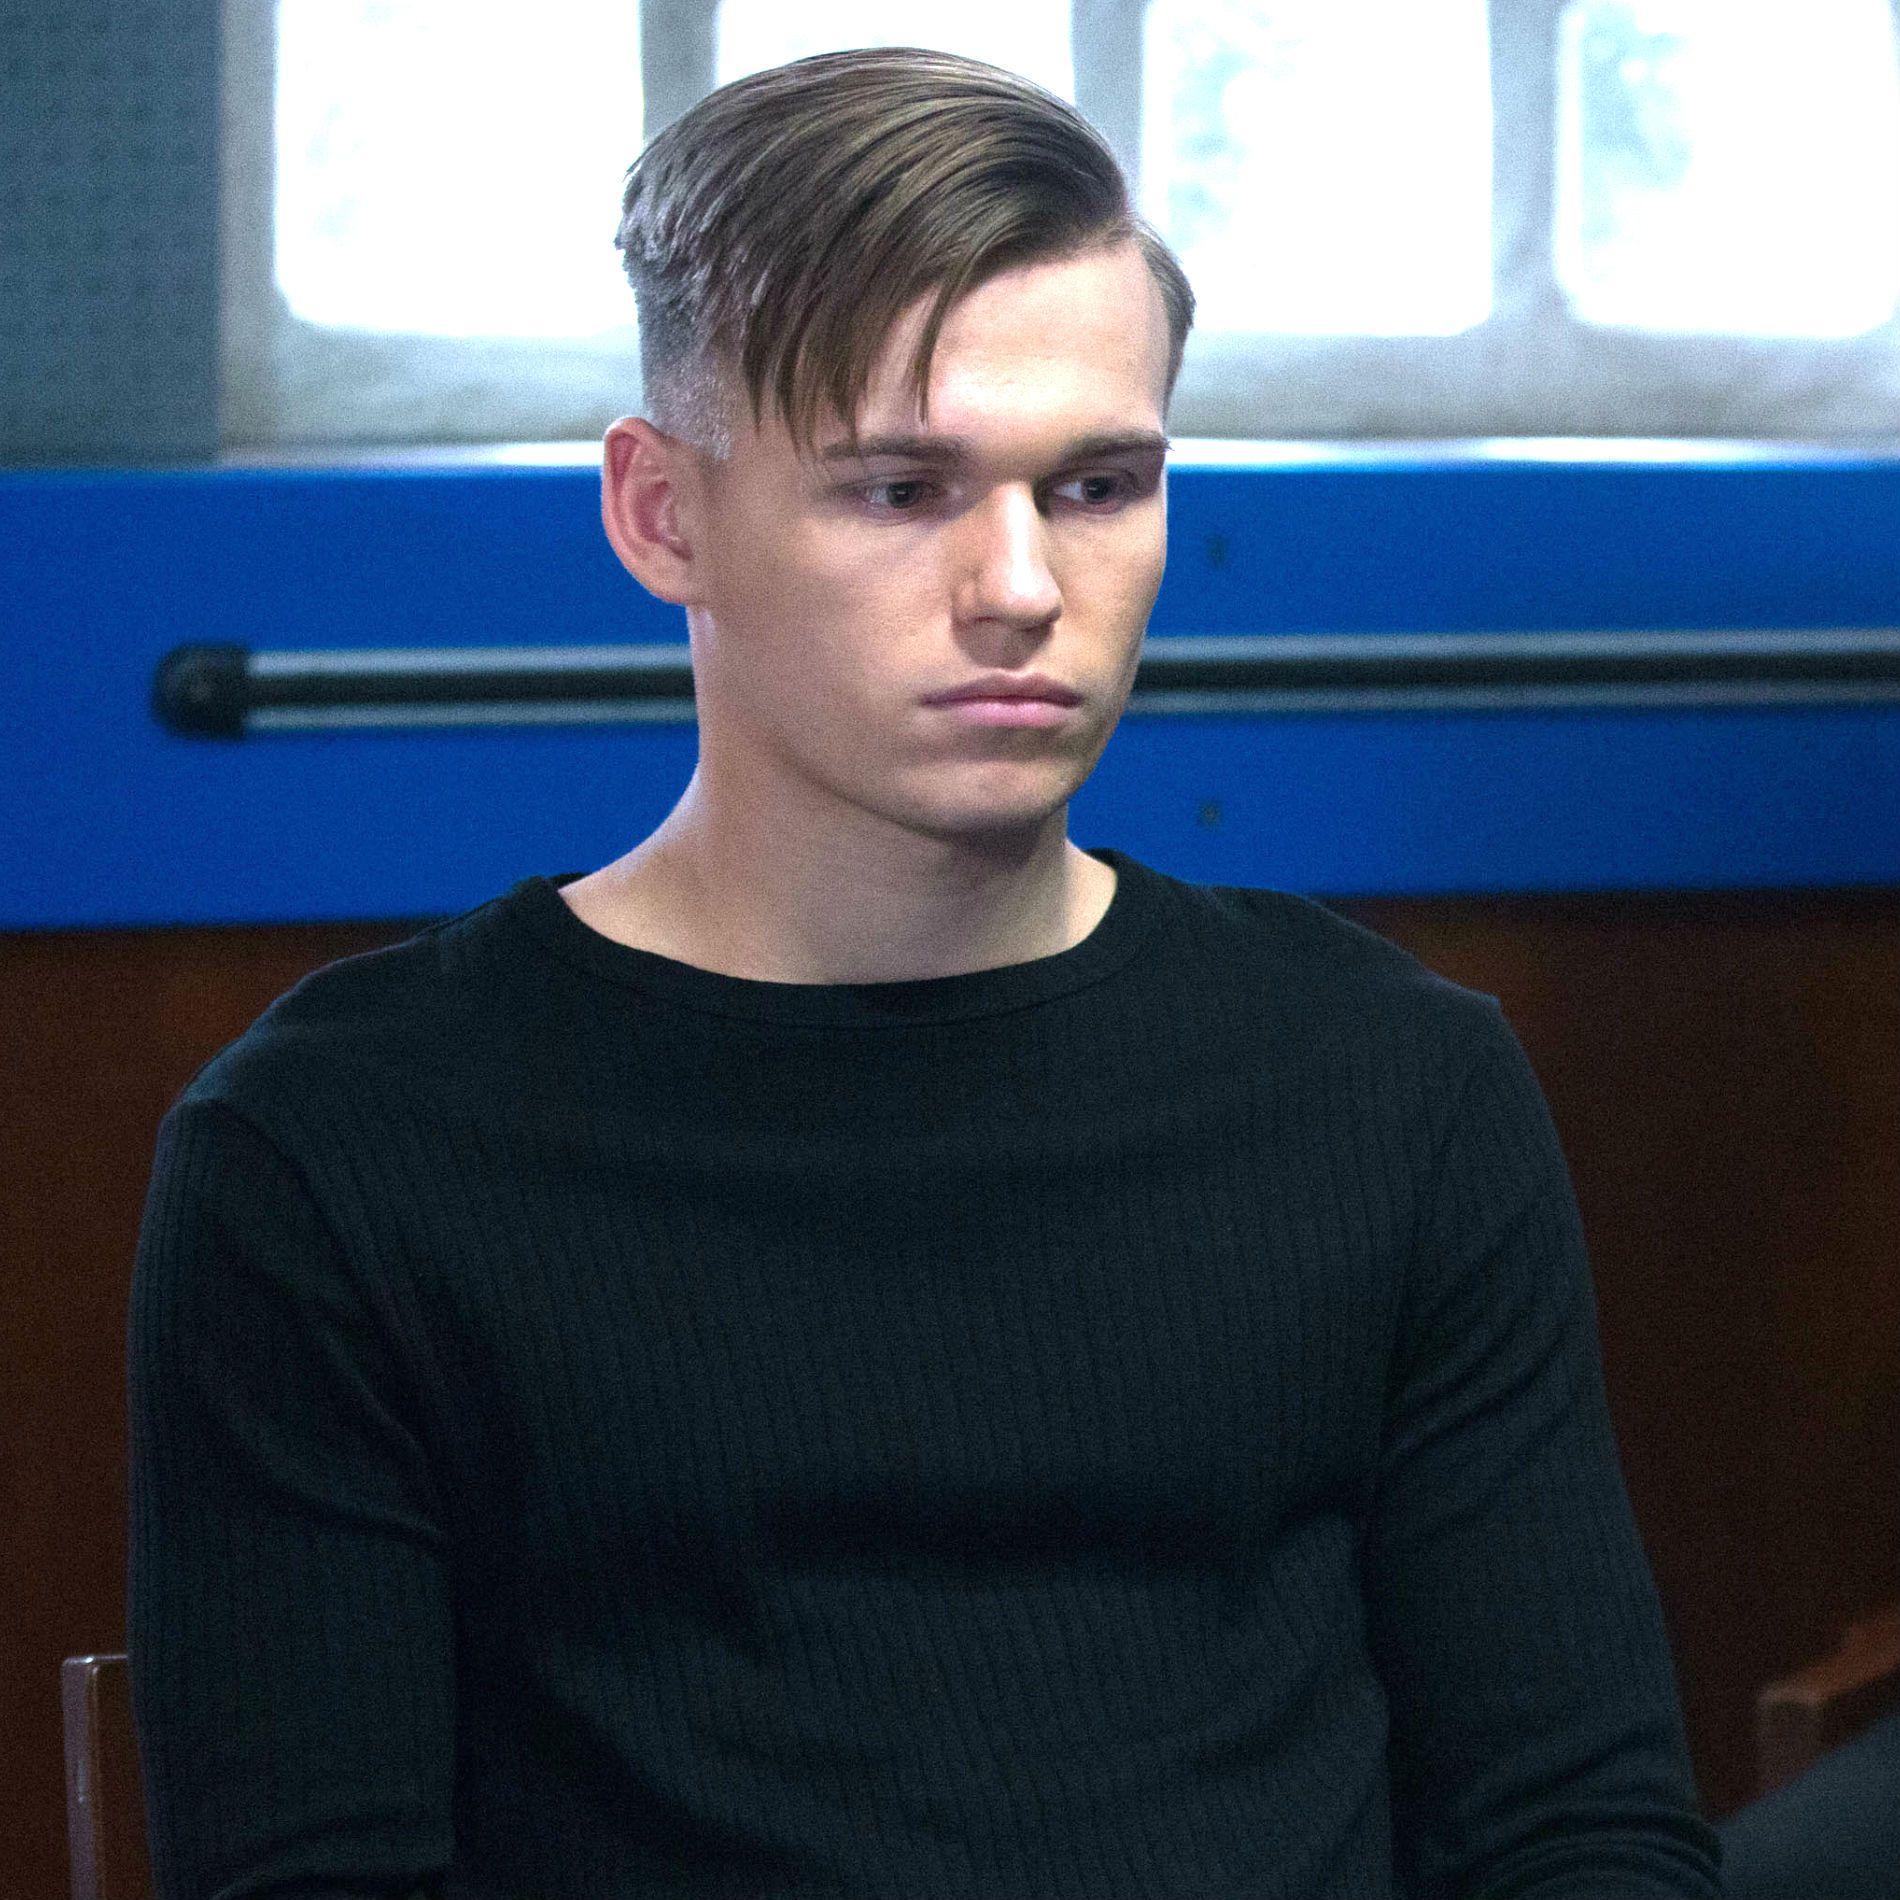 EastEnders spoilers - Hunter Owen to be interrogated by police